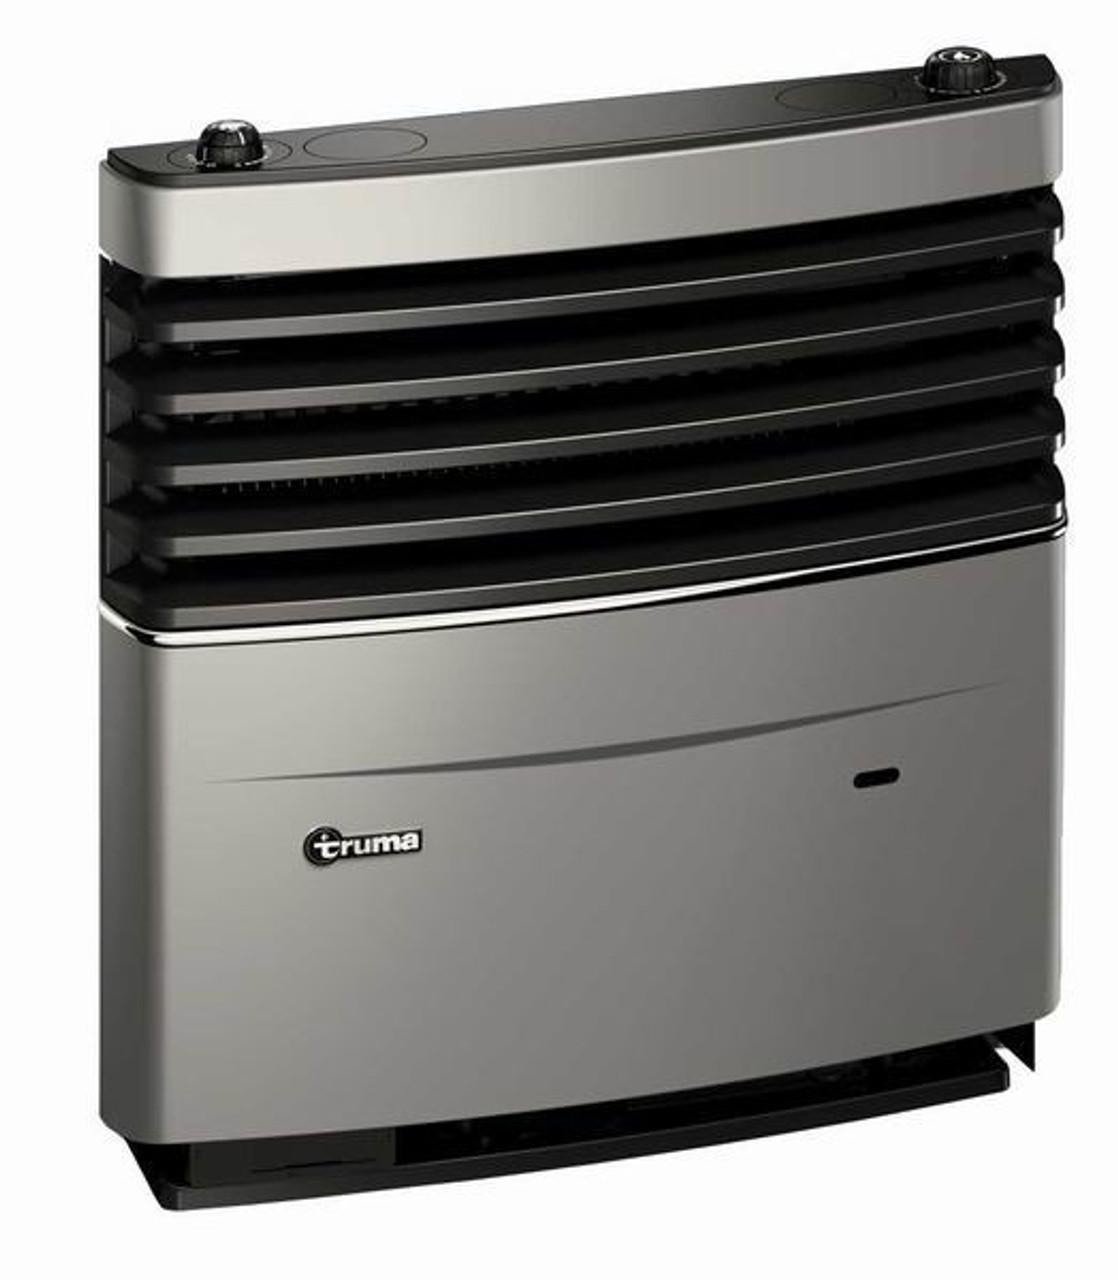 Truma S3004 Caravan & Motorhome Gas Heater LPG